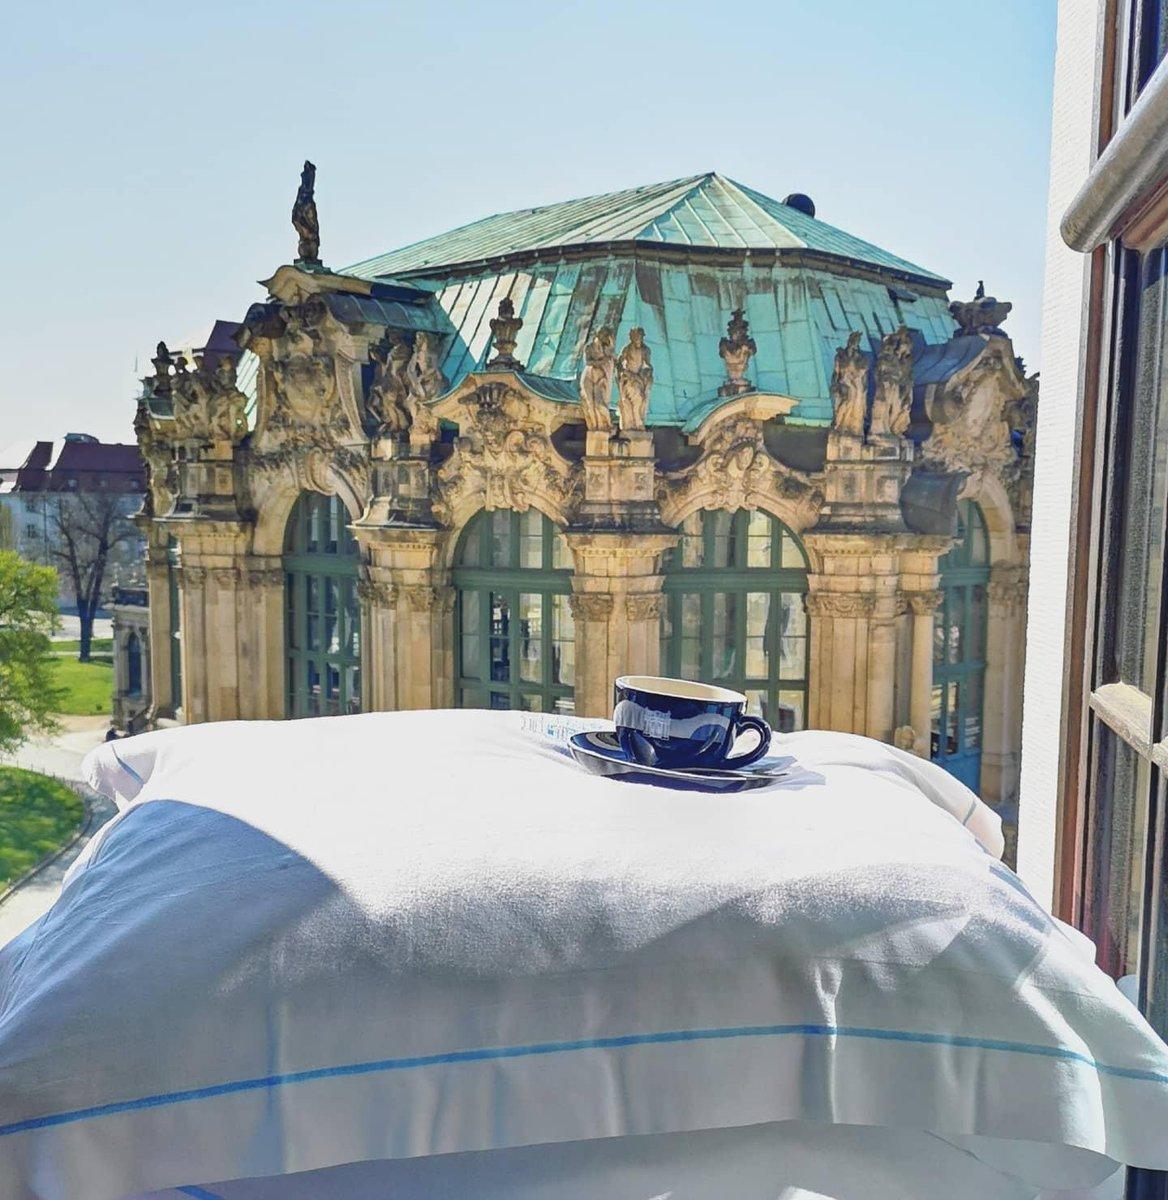 Breakfast in bed, at Hotel Taschenbergpalais Kempinski Dresden. #Kempinski #KEMPINSKIDISCOVERY #DiscoveryLoyalty https://t.co/KQTRg9L8Ca